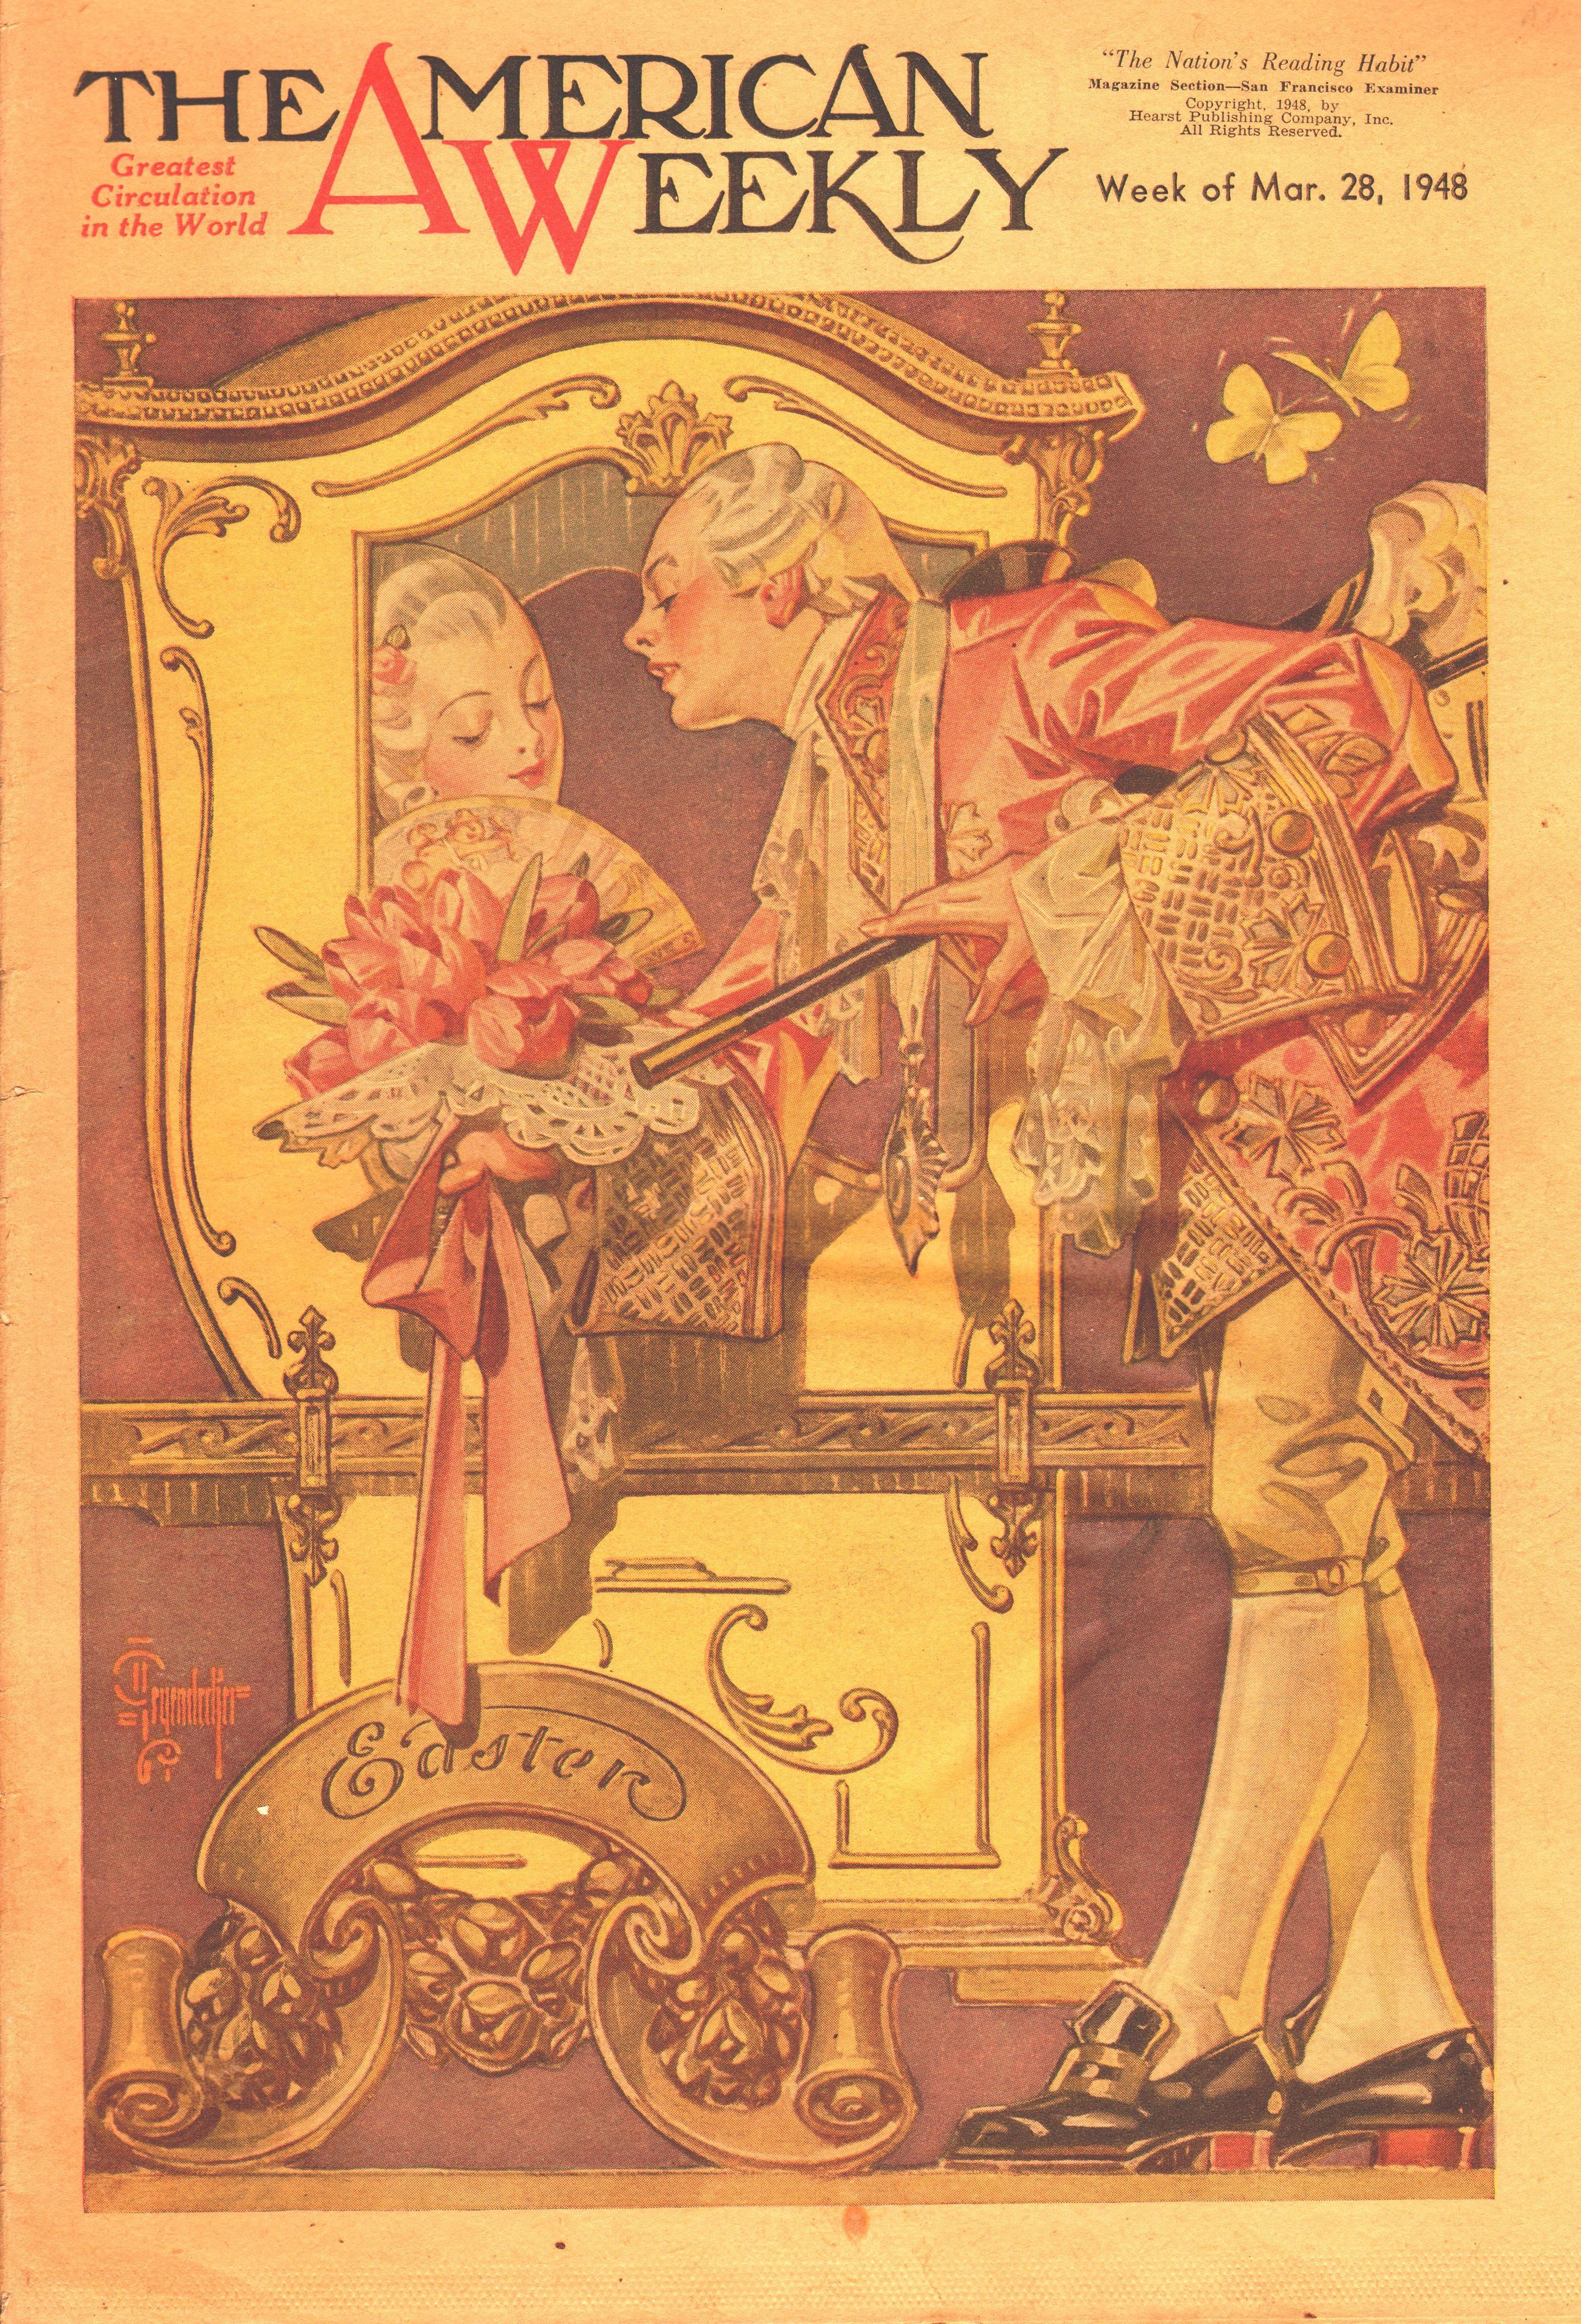 J. C. Leyendecker The American Weekly Magazine cover